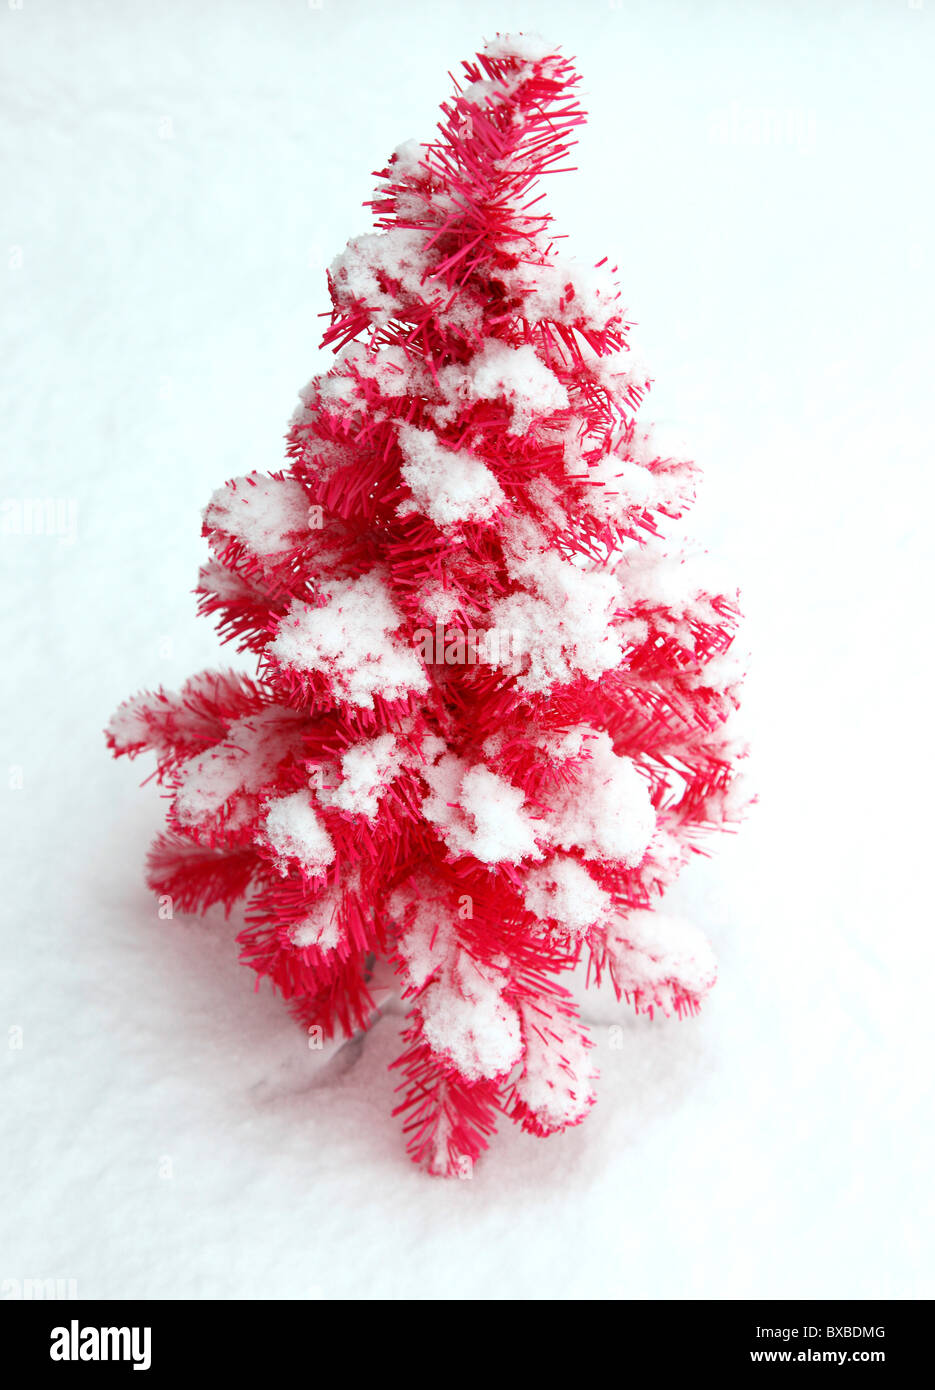 Pink Alternative Christmas Tree Artificial Plastic Design Stock Photo Alamy